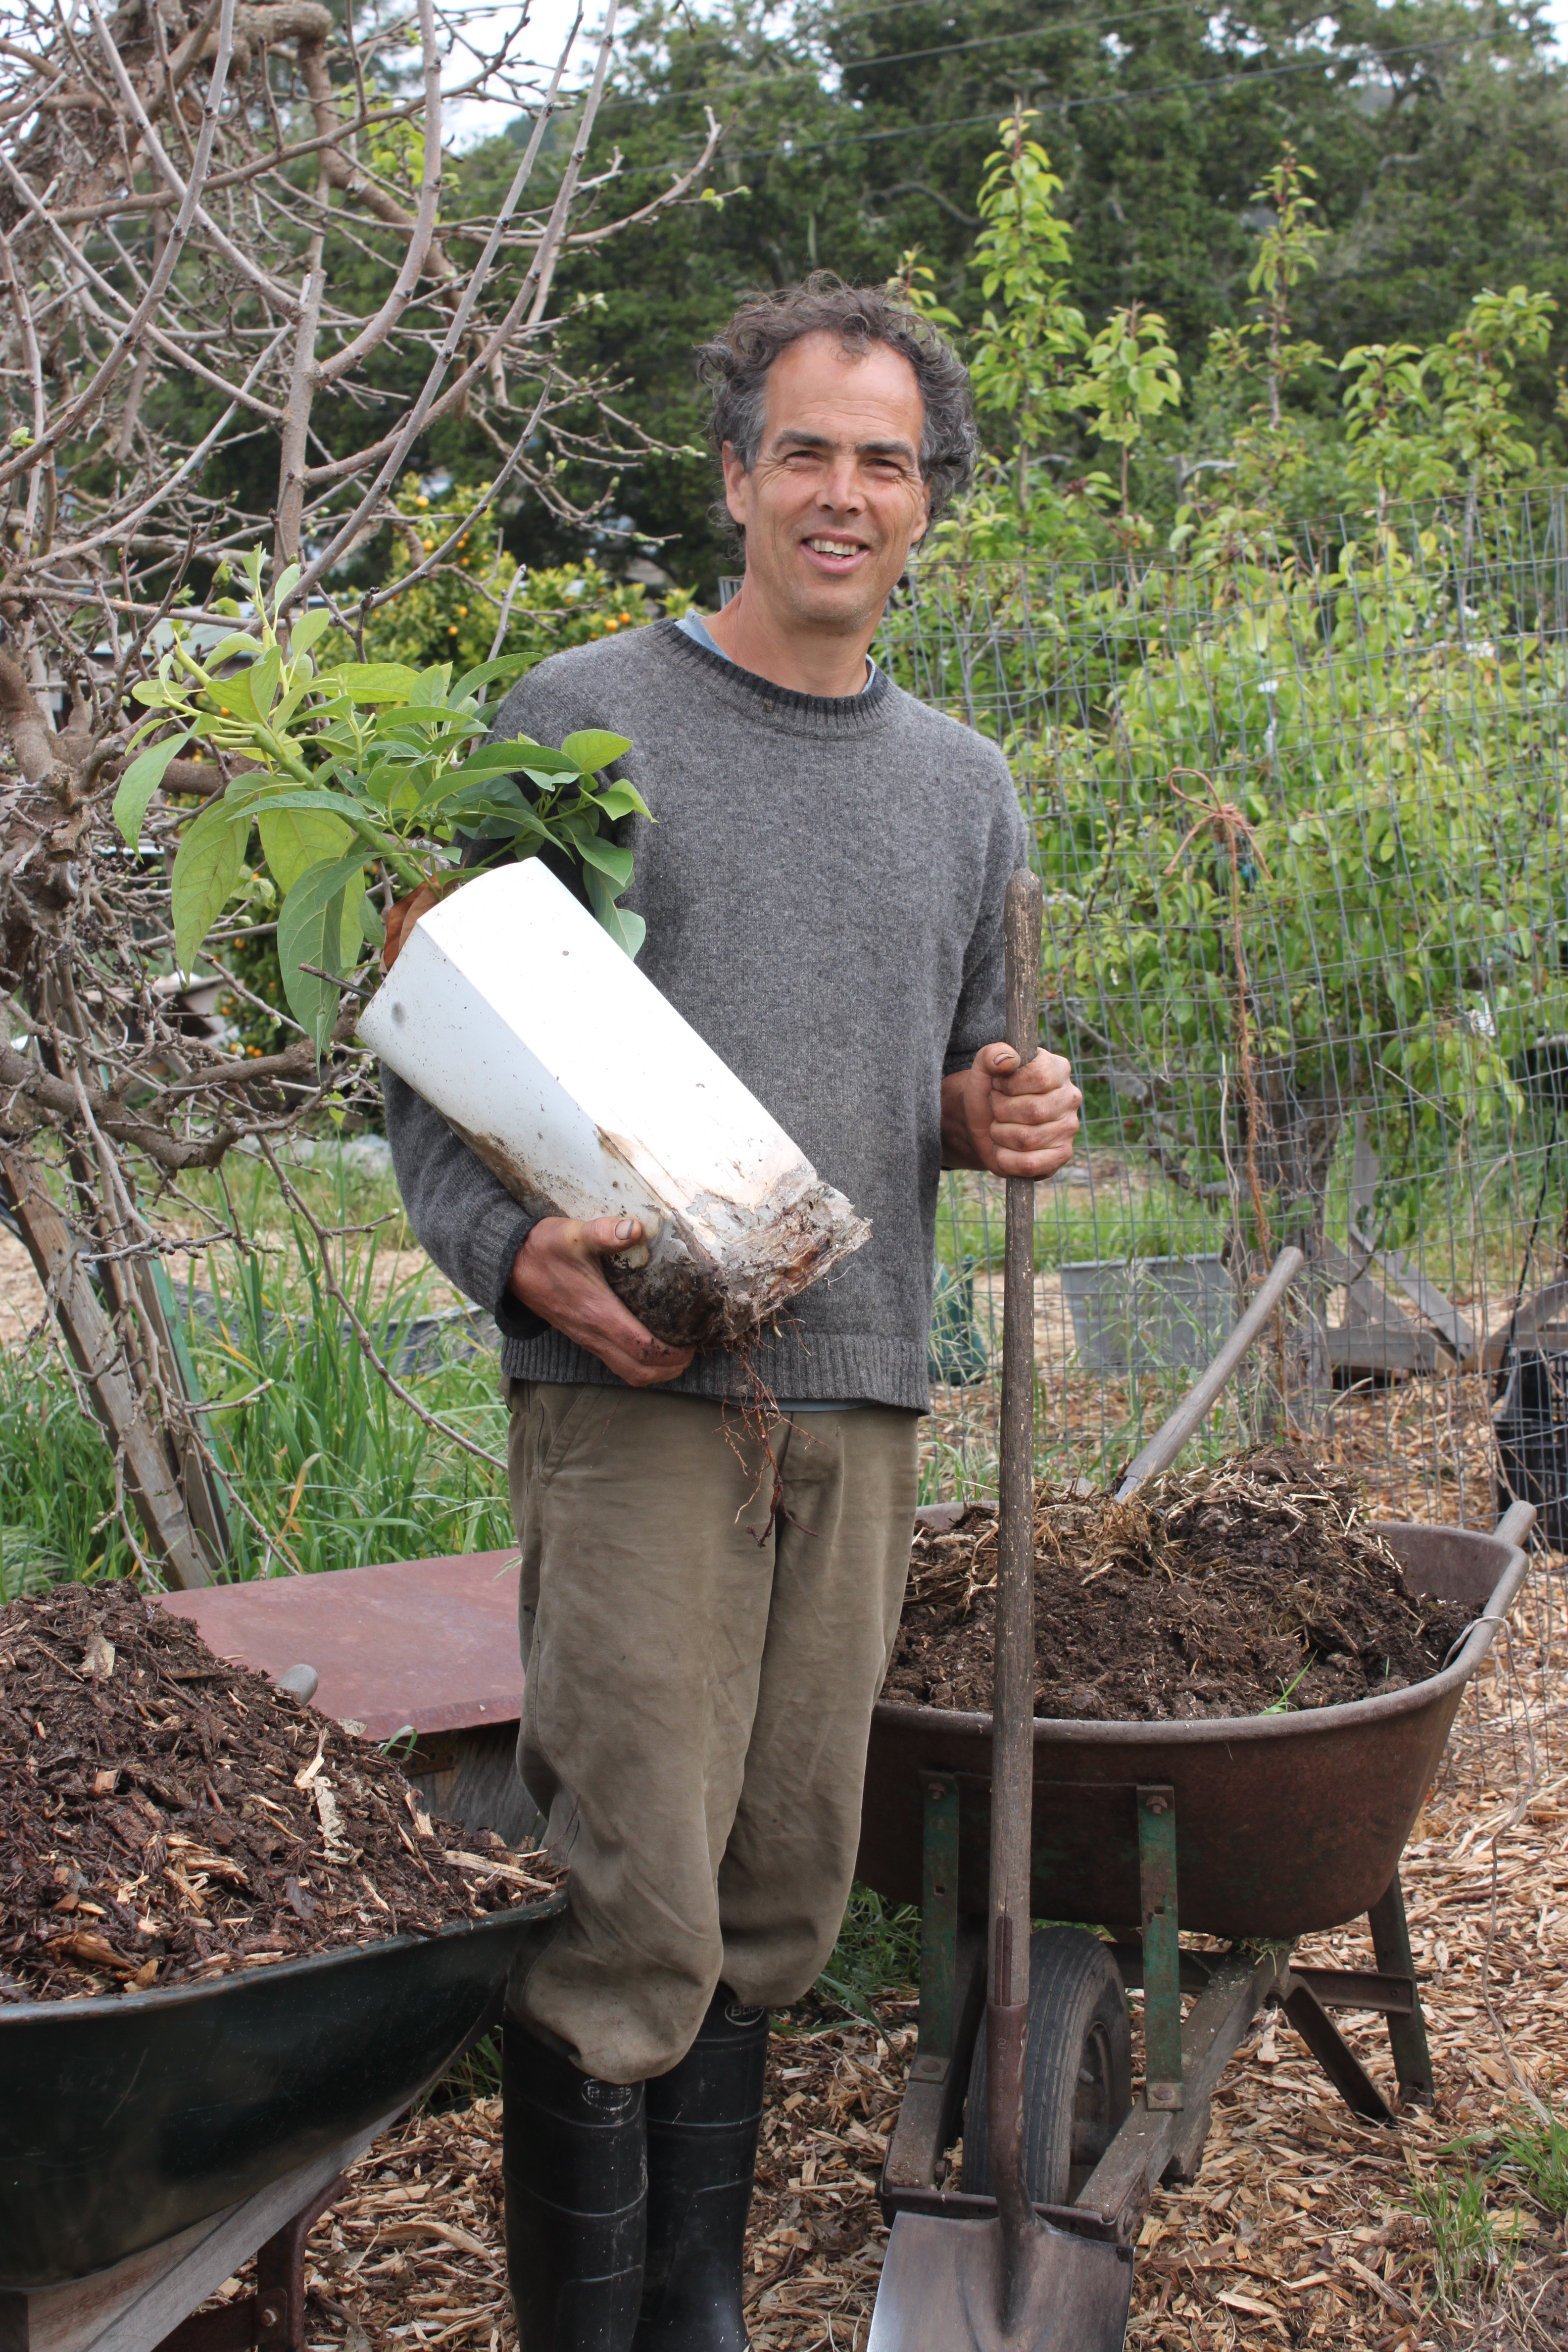 fertilizer is necessary essay Related documents: black: oxygen and organic nitrogen fertilizer essay ibuprofen: oxygen and small organic compound essay ibuprofen is also known as: brufen, motrin, dolgit, liptan, nuprin, and butylenin.